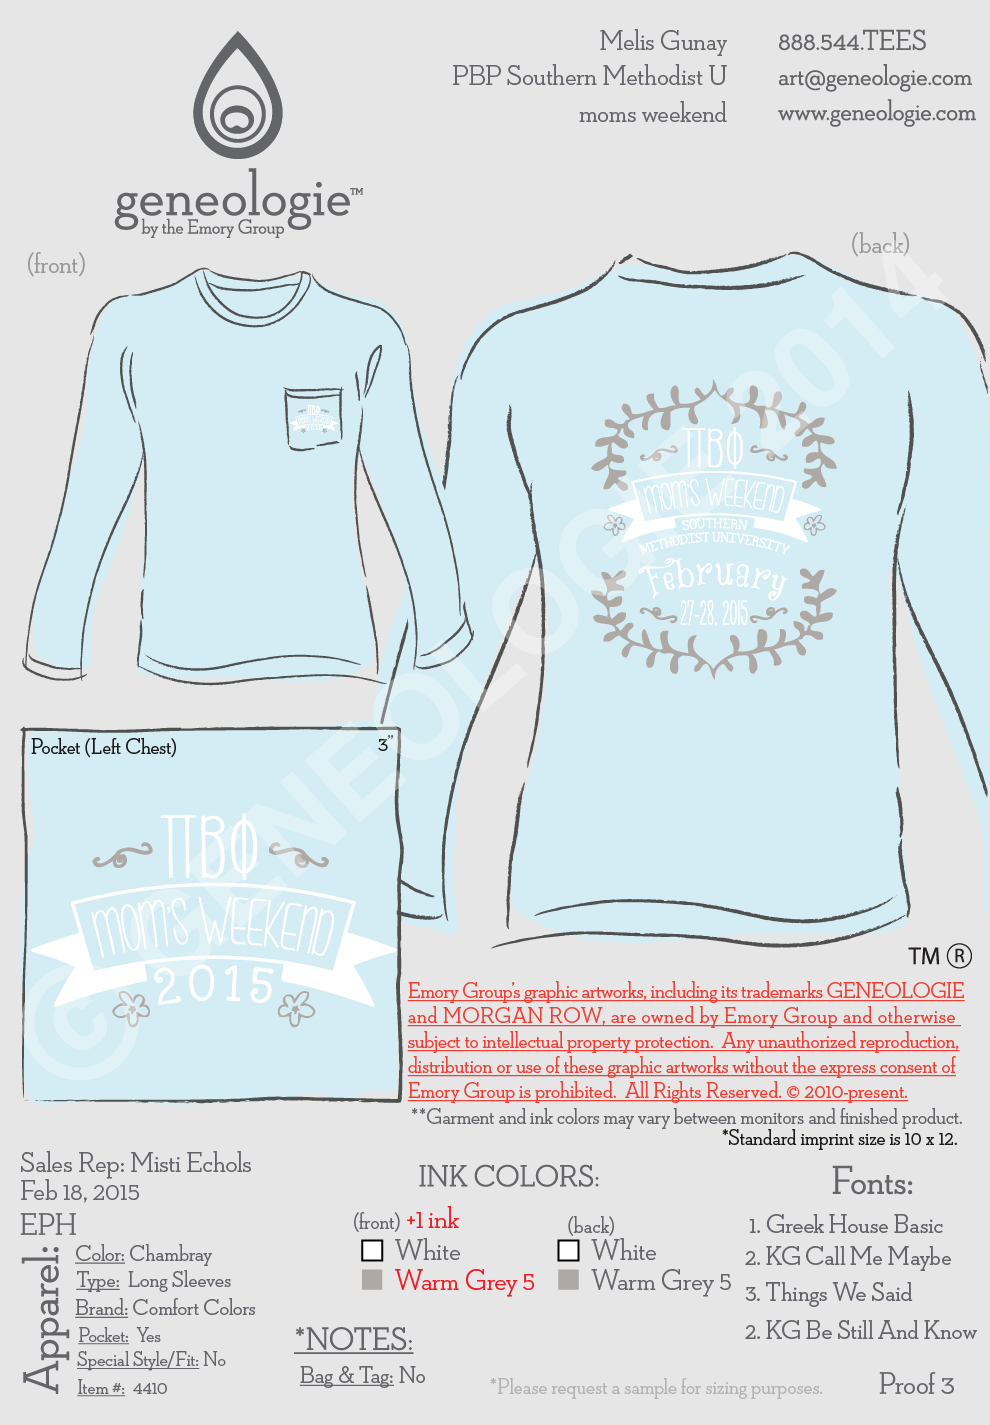 aa3baf48 SMU Pi Beta Phi Mom's weekend t-shirt design | TEE SHIRT IDEAS ...